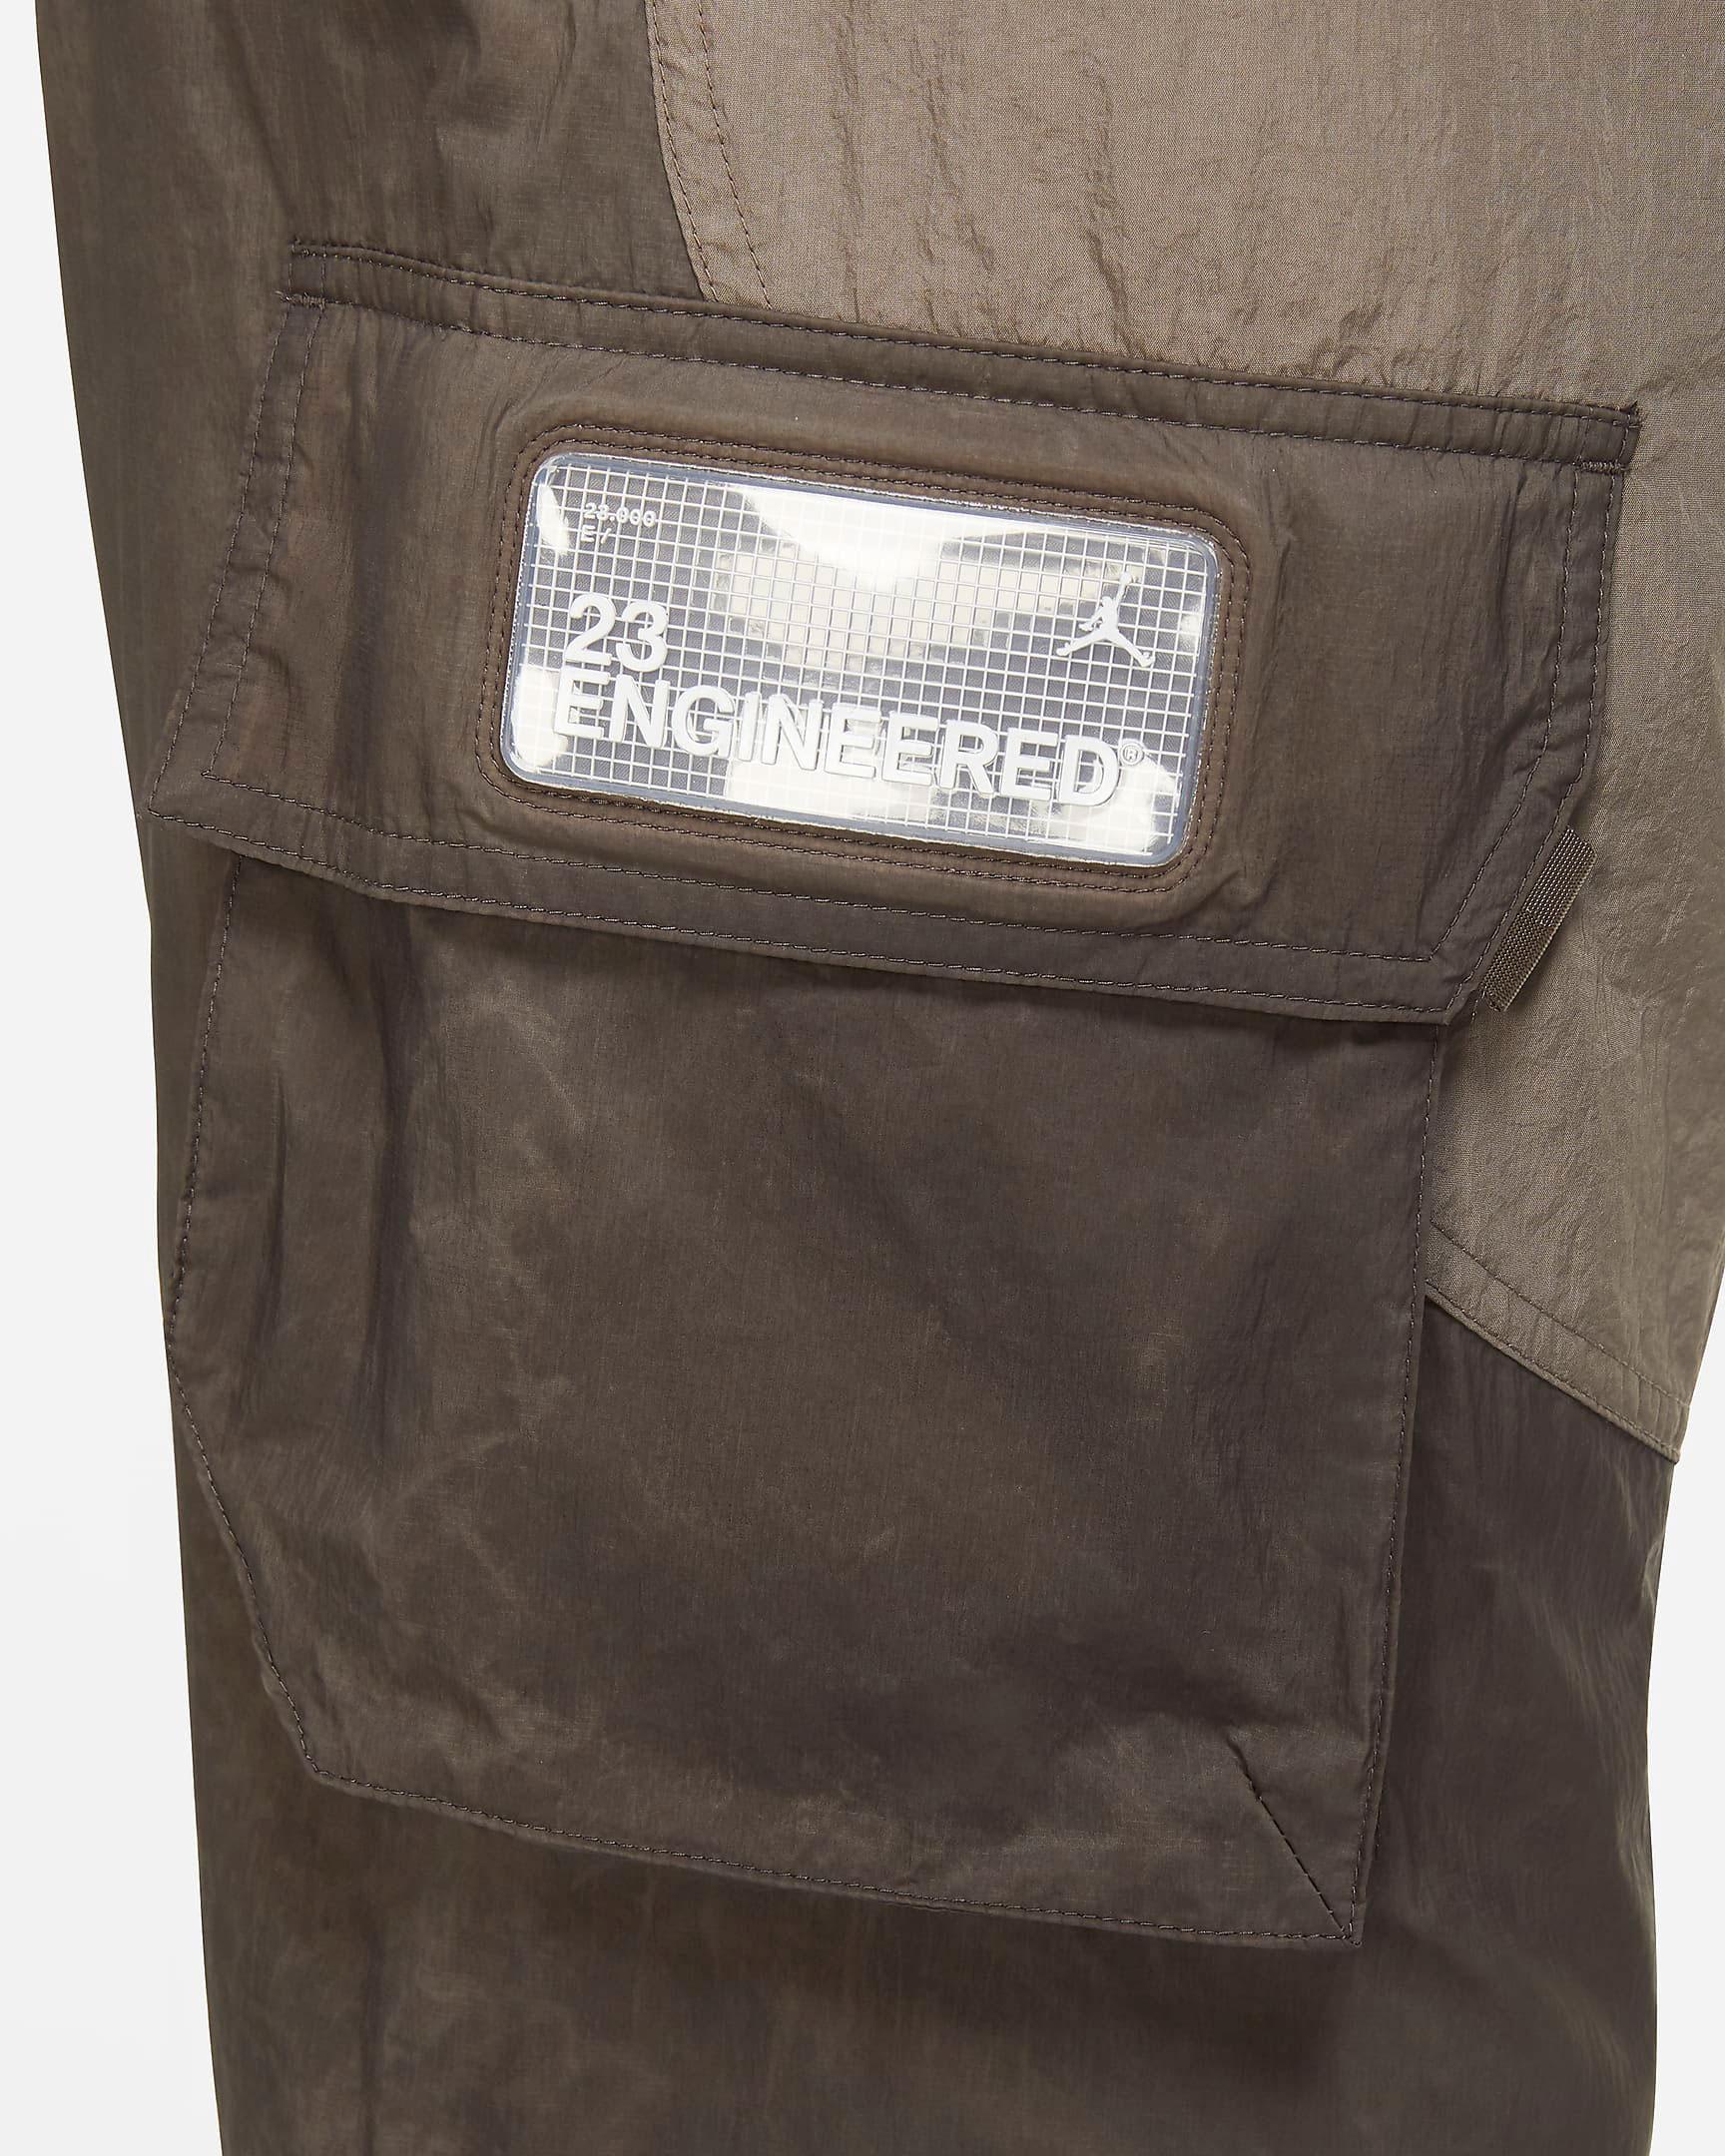 jordan-1-dark-mocha-cargo-pants-match-5